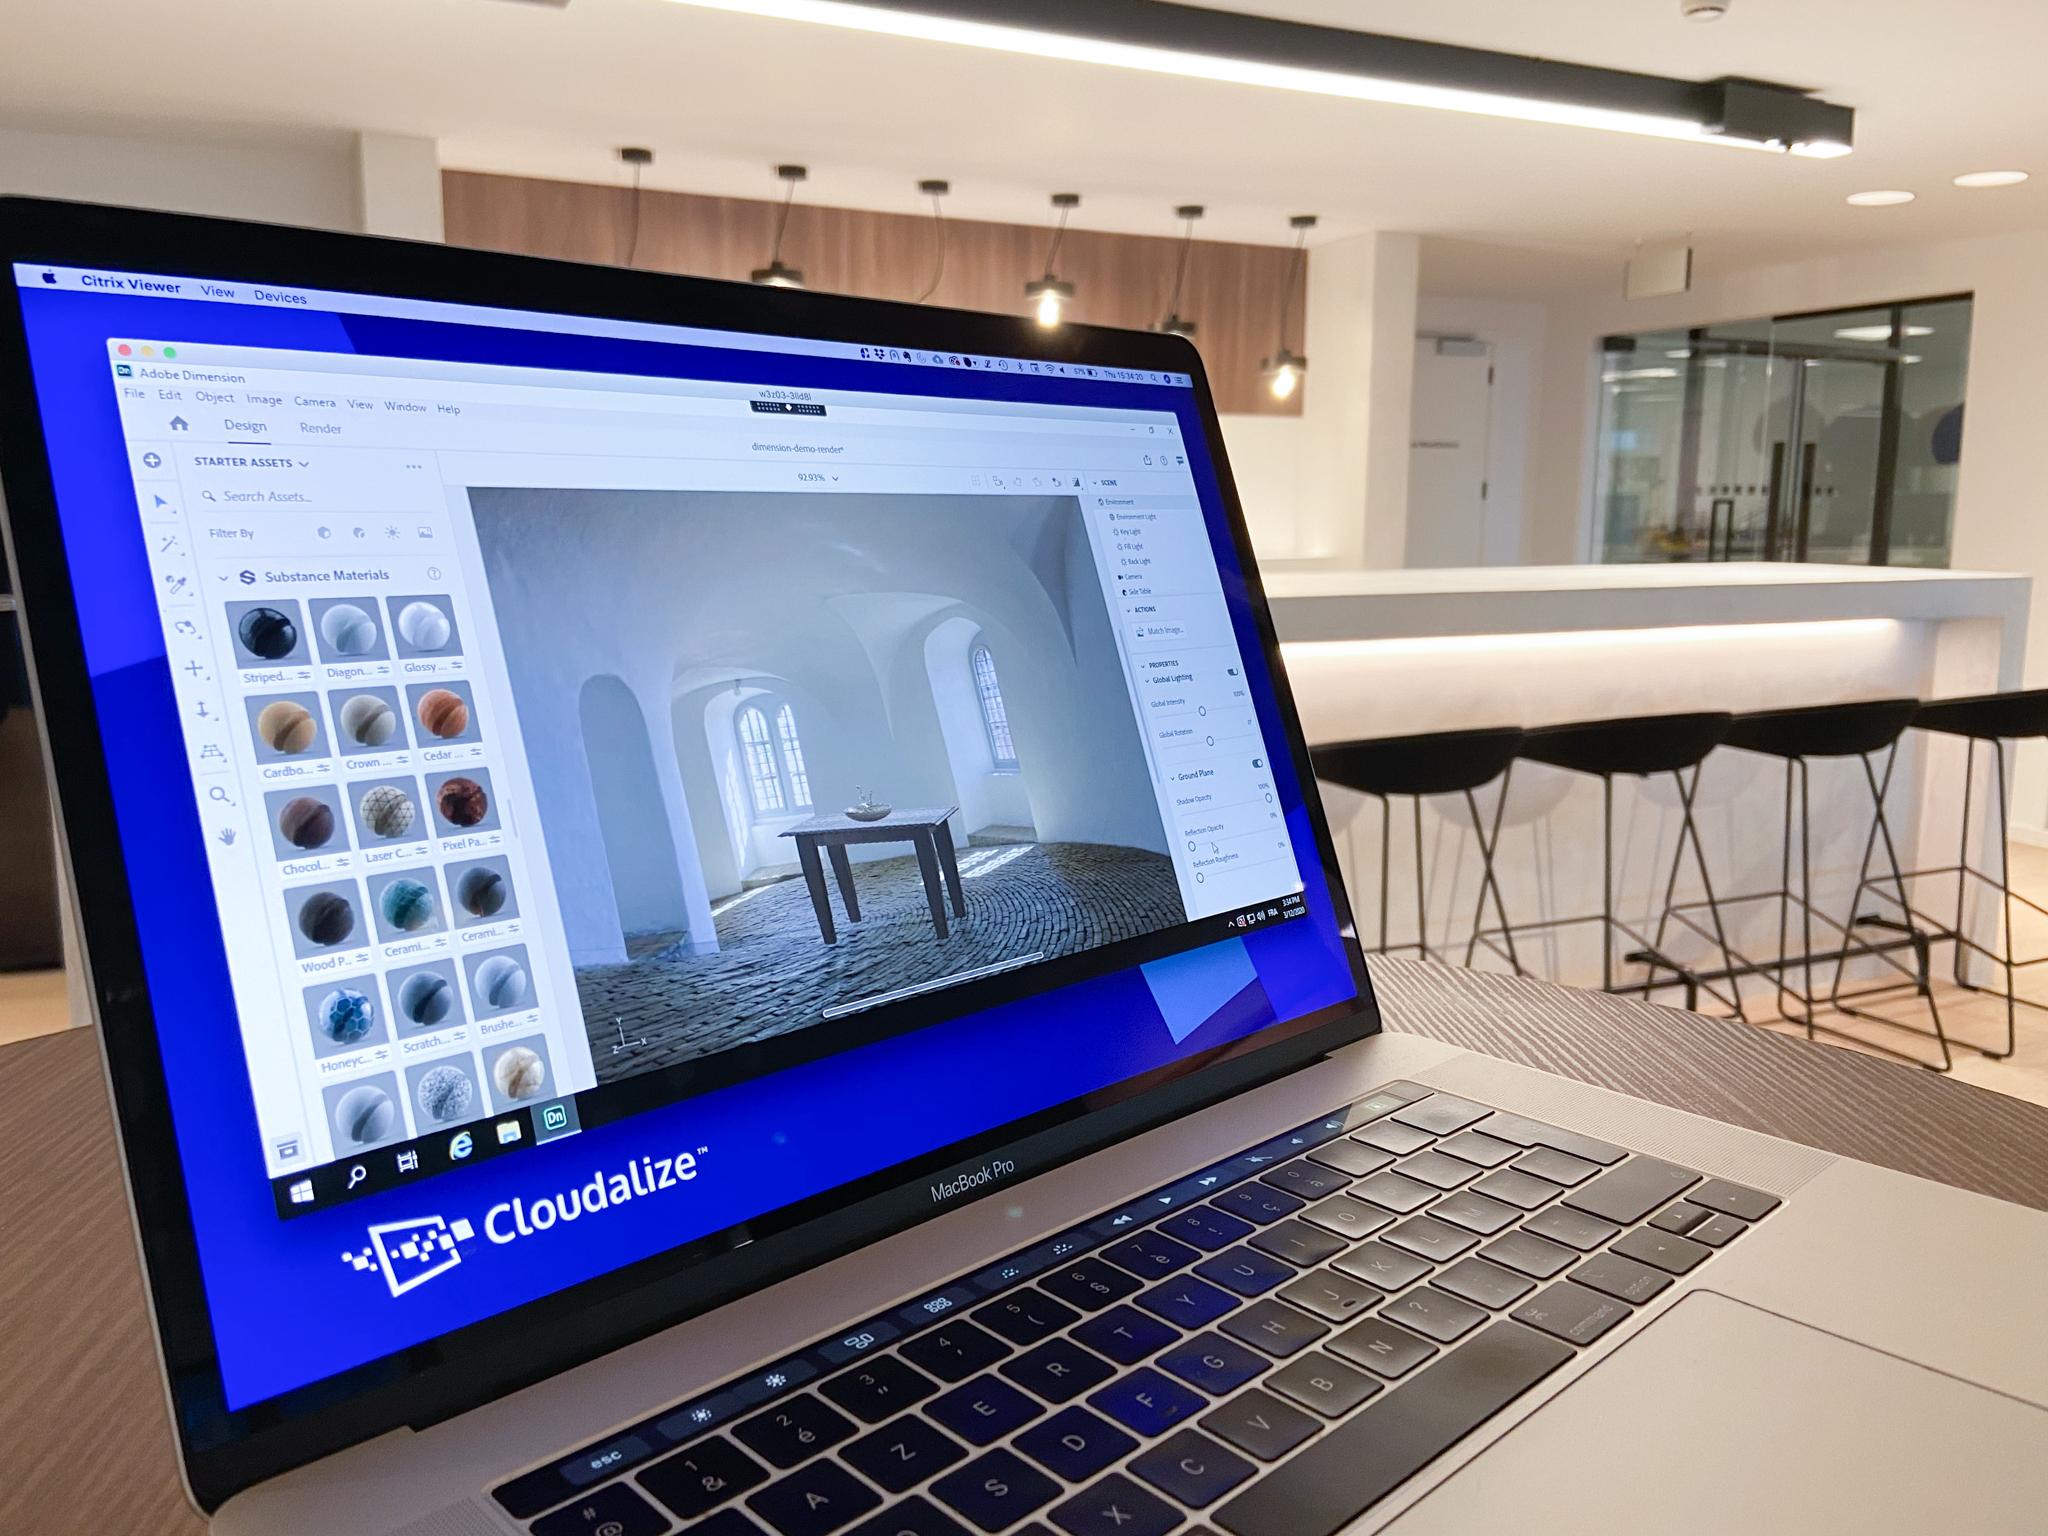 DaaS Desktop-as-a-Service Solution Cloudalize GPU solution Dimension Adobe